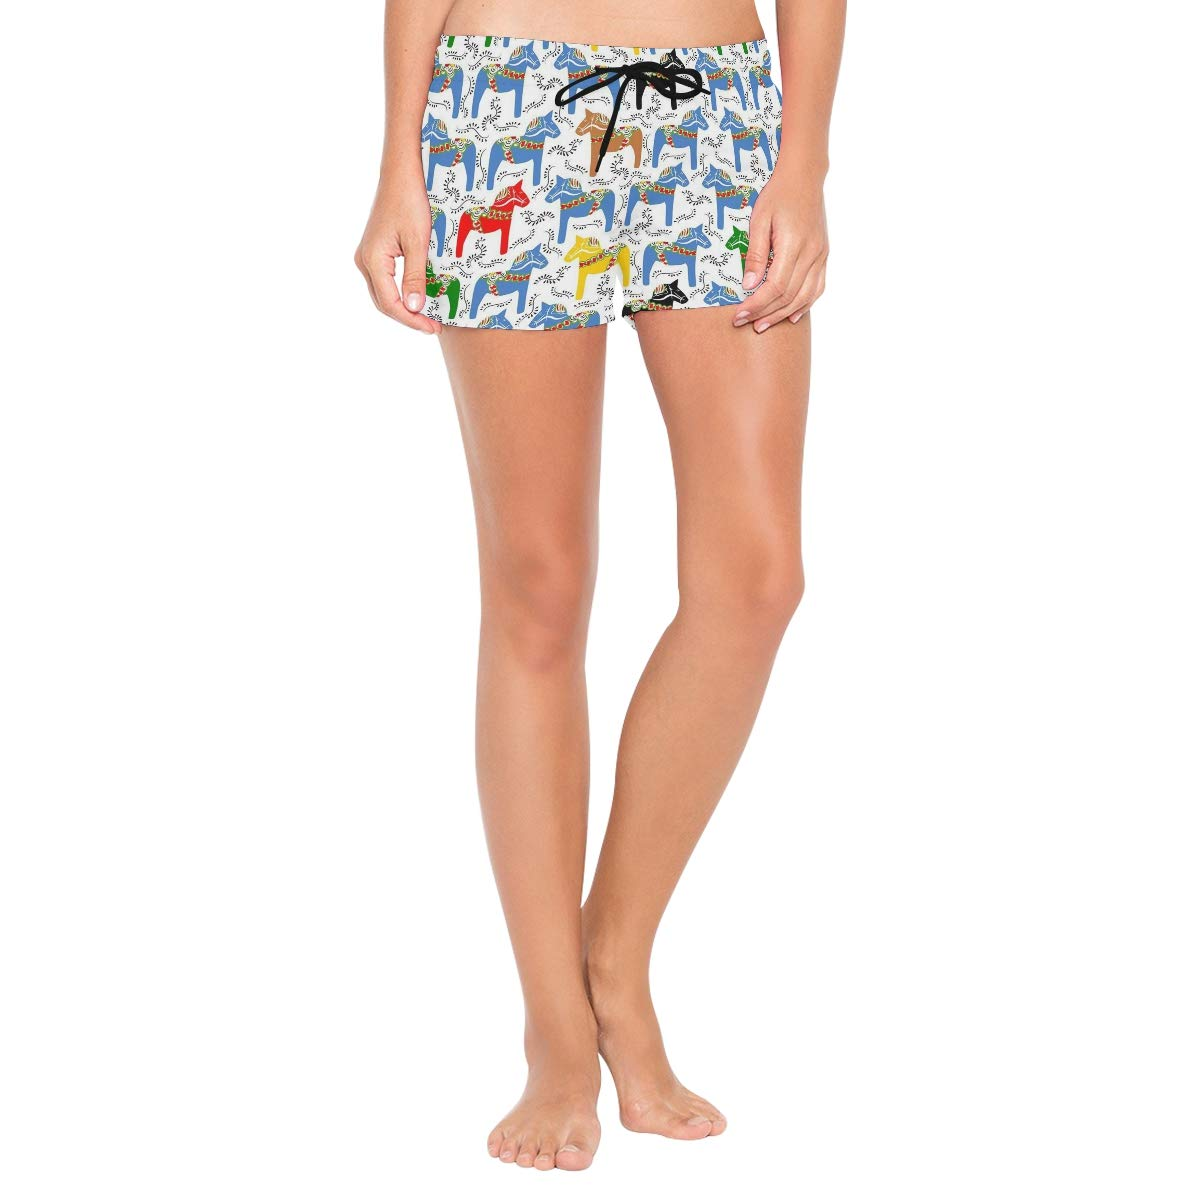 Dala Horses Lttedeng Womens Print Beach Shorts with Pockets Quick Dry Boardshort Swimming Trunks Tropical Short